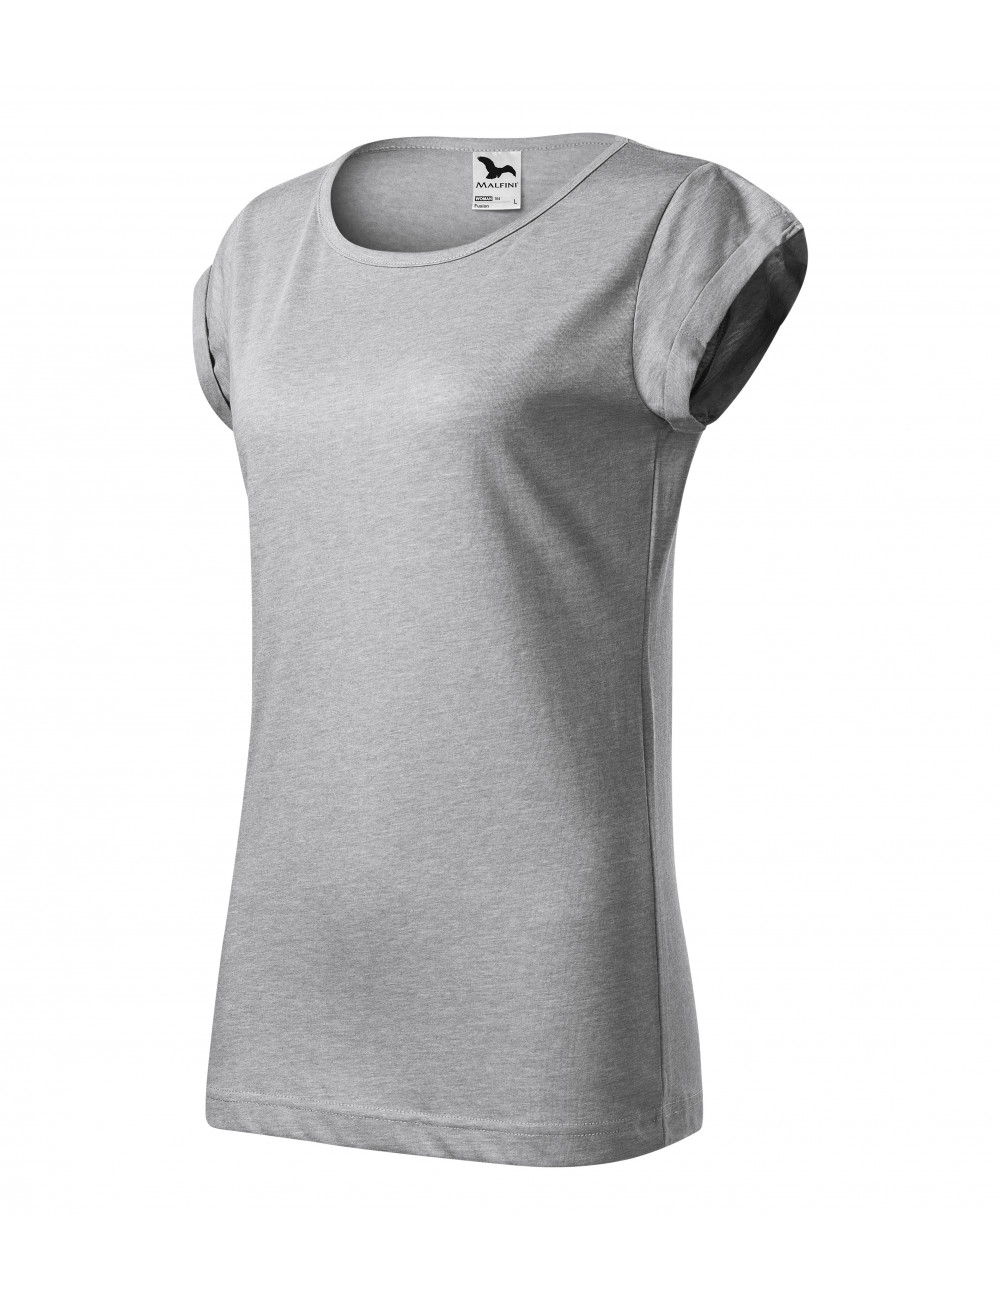 Adler MALFINI Koszulka damska Fusion 164 srebrny melanż